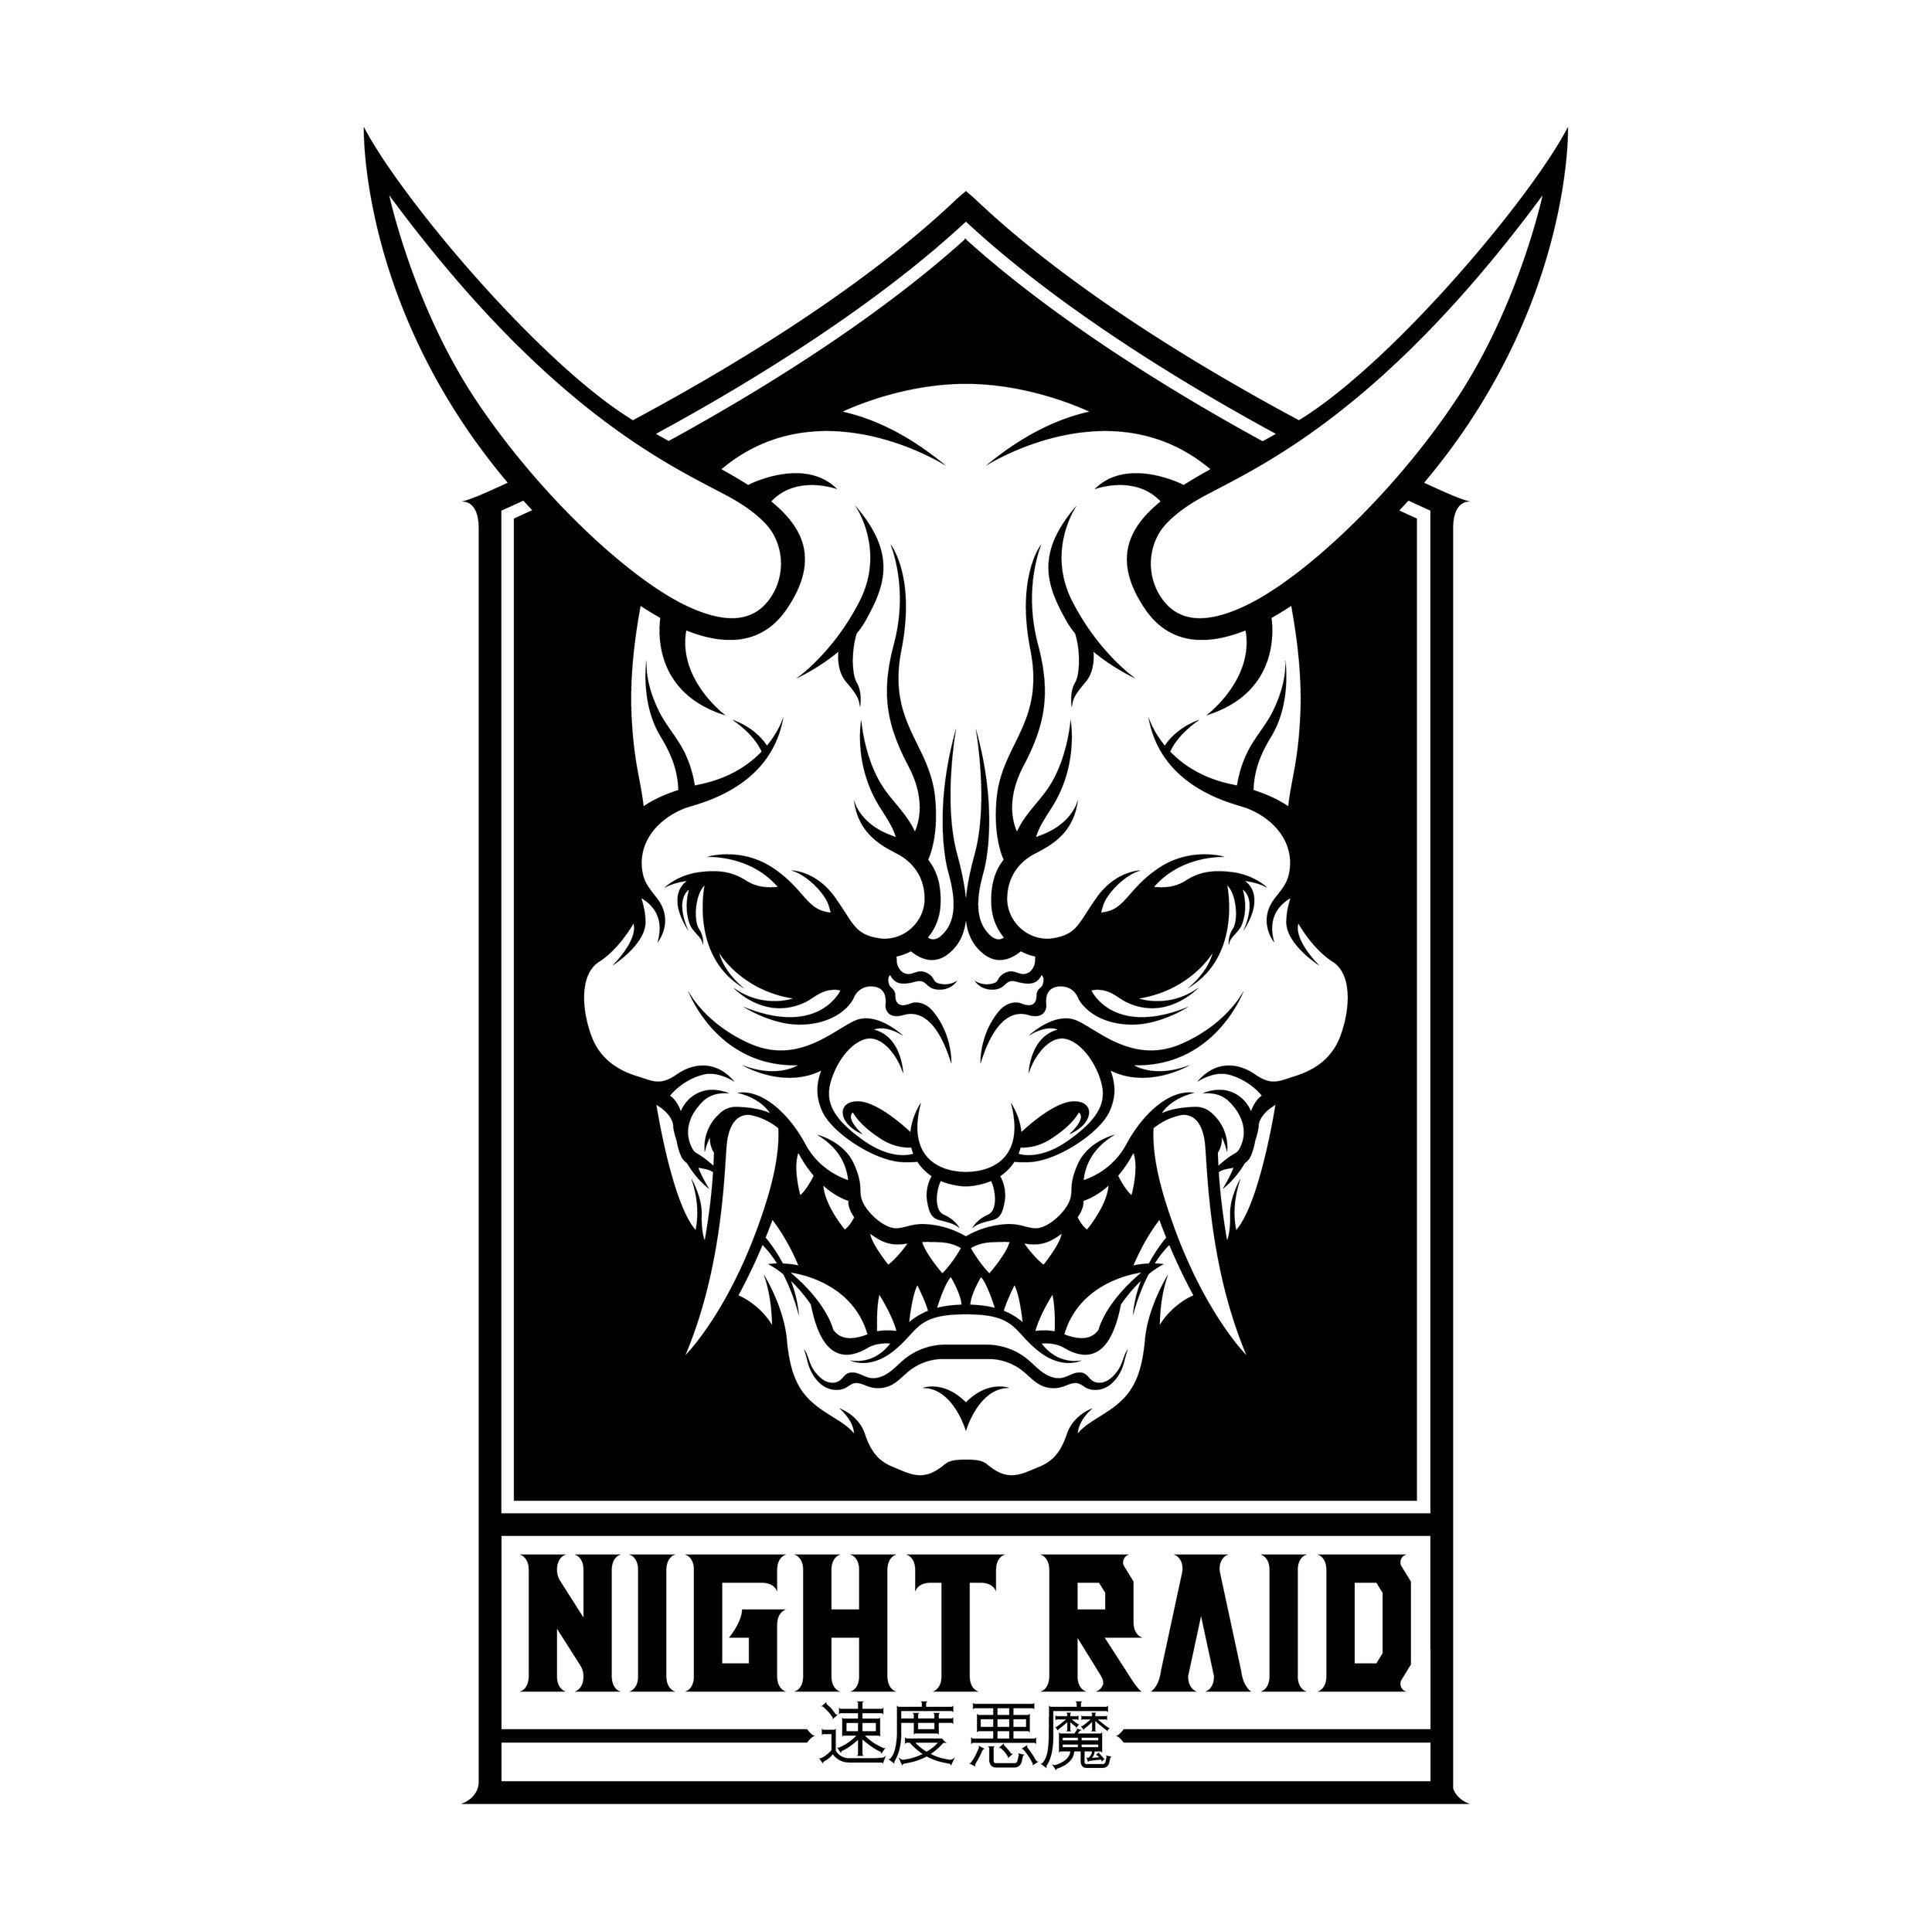 nightraid-orozcodesign-onimask-logo.jpg